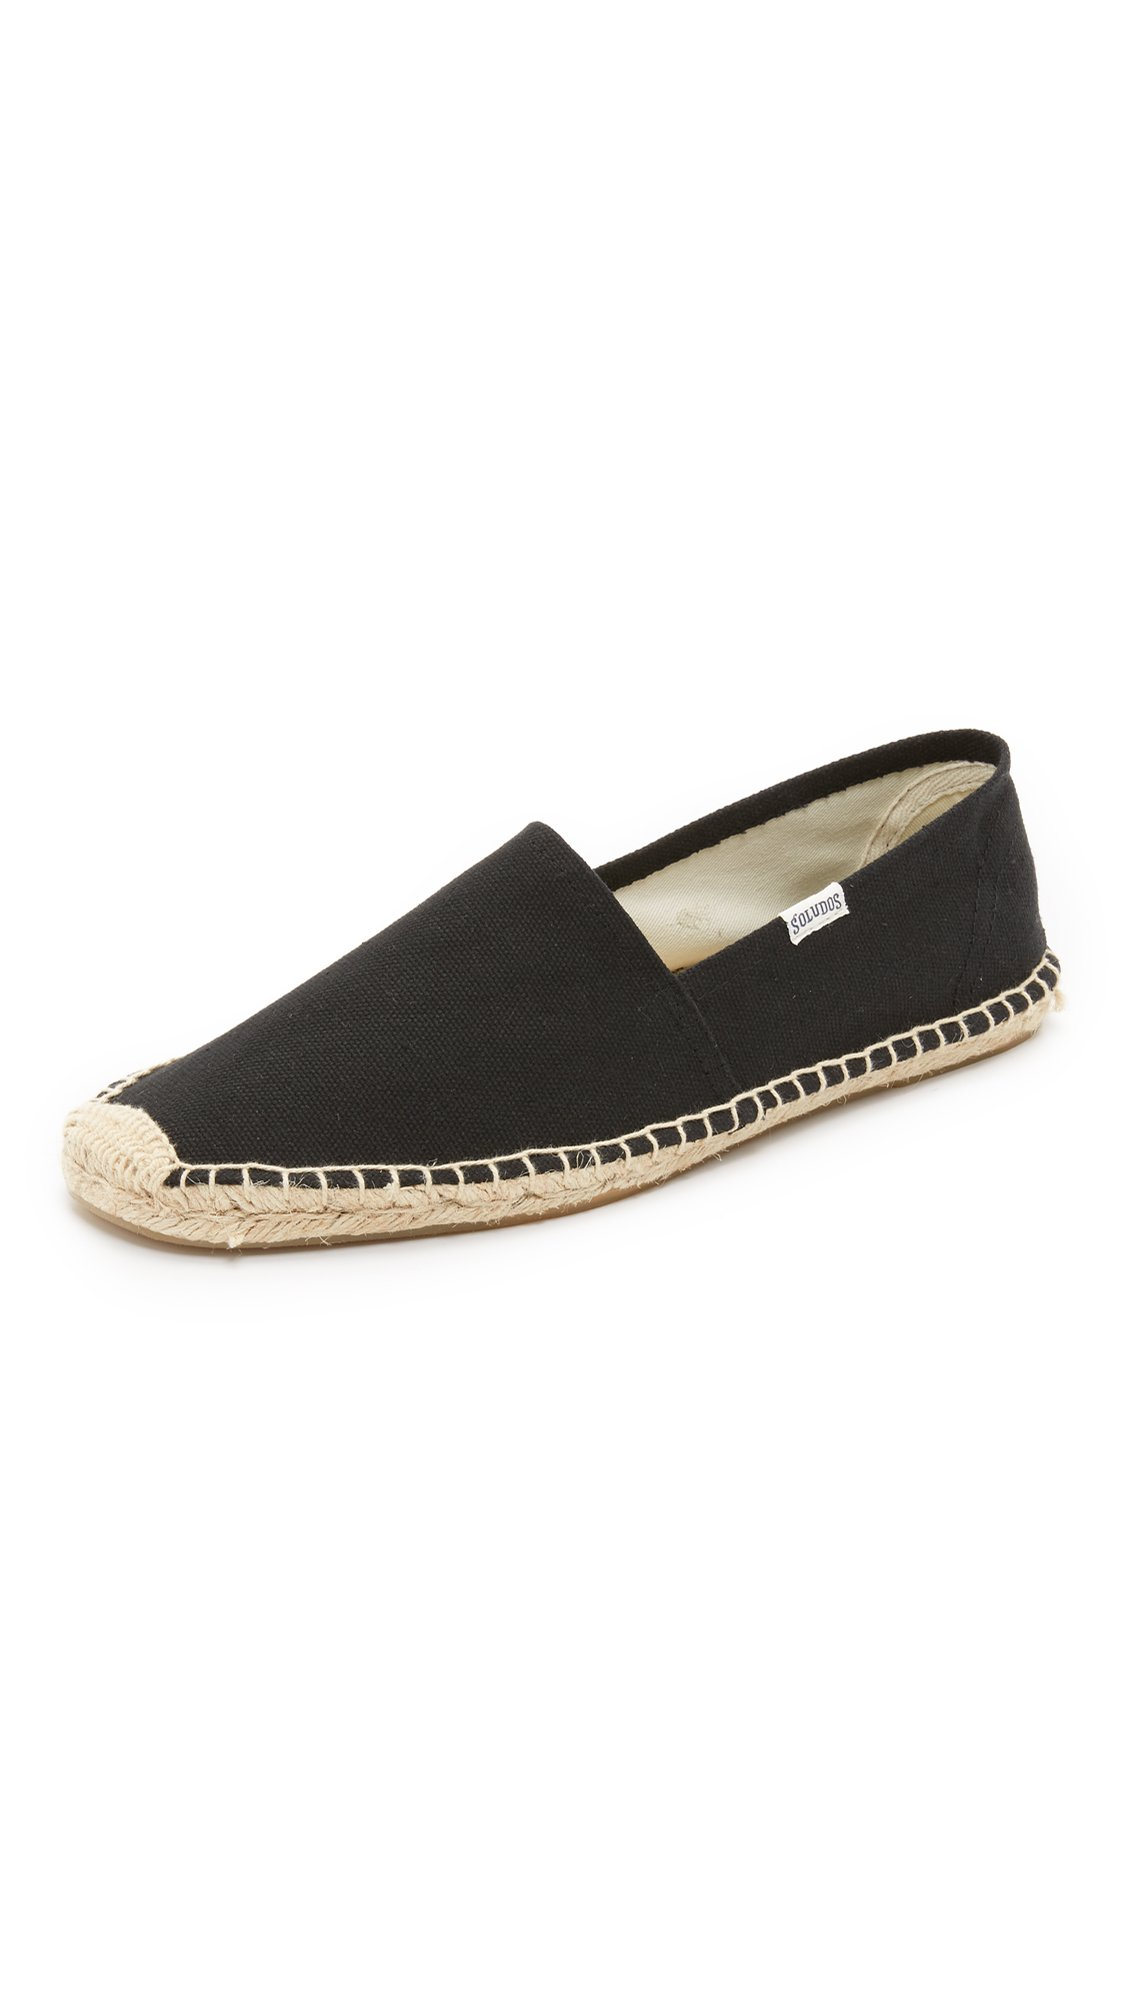 Soludos Men's Solid Original Dali Sandal, Black, 12 M US